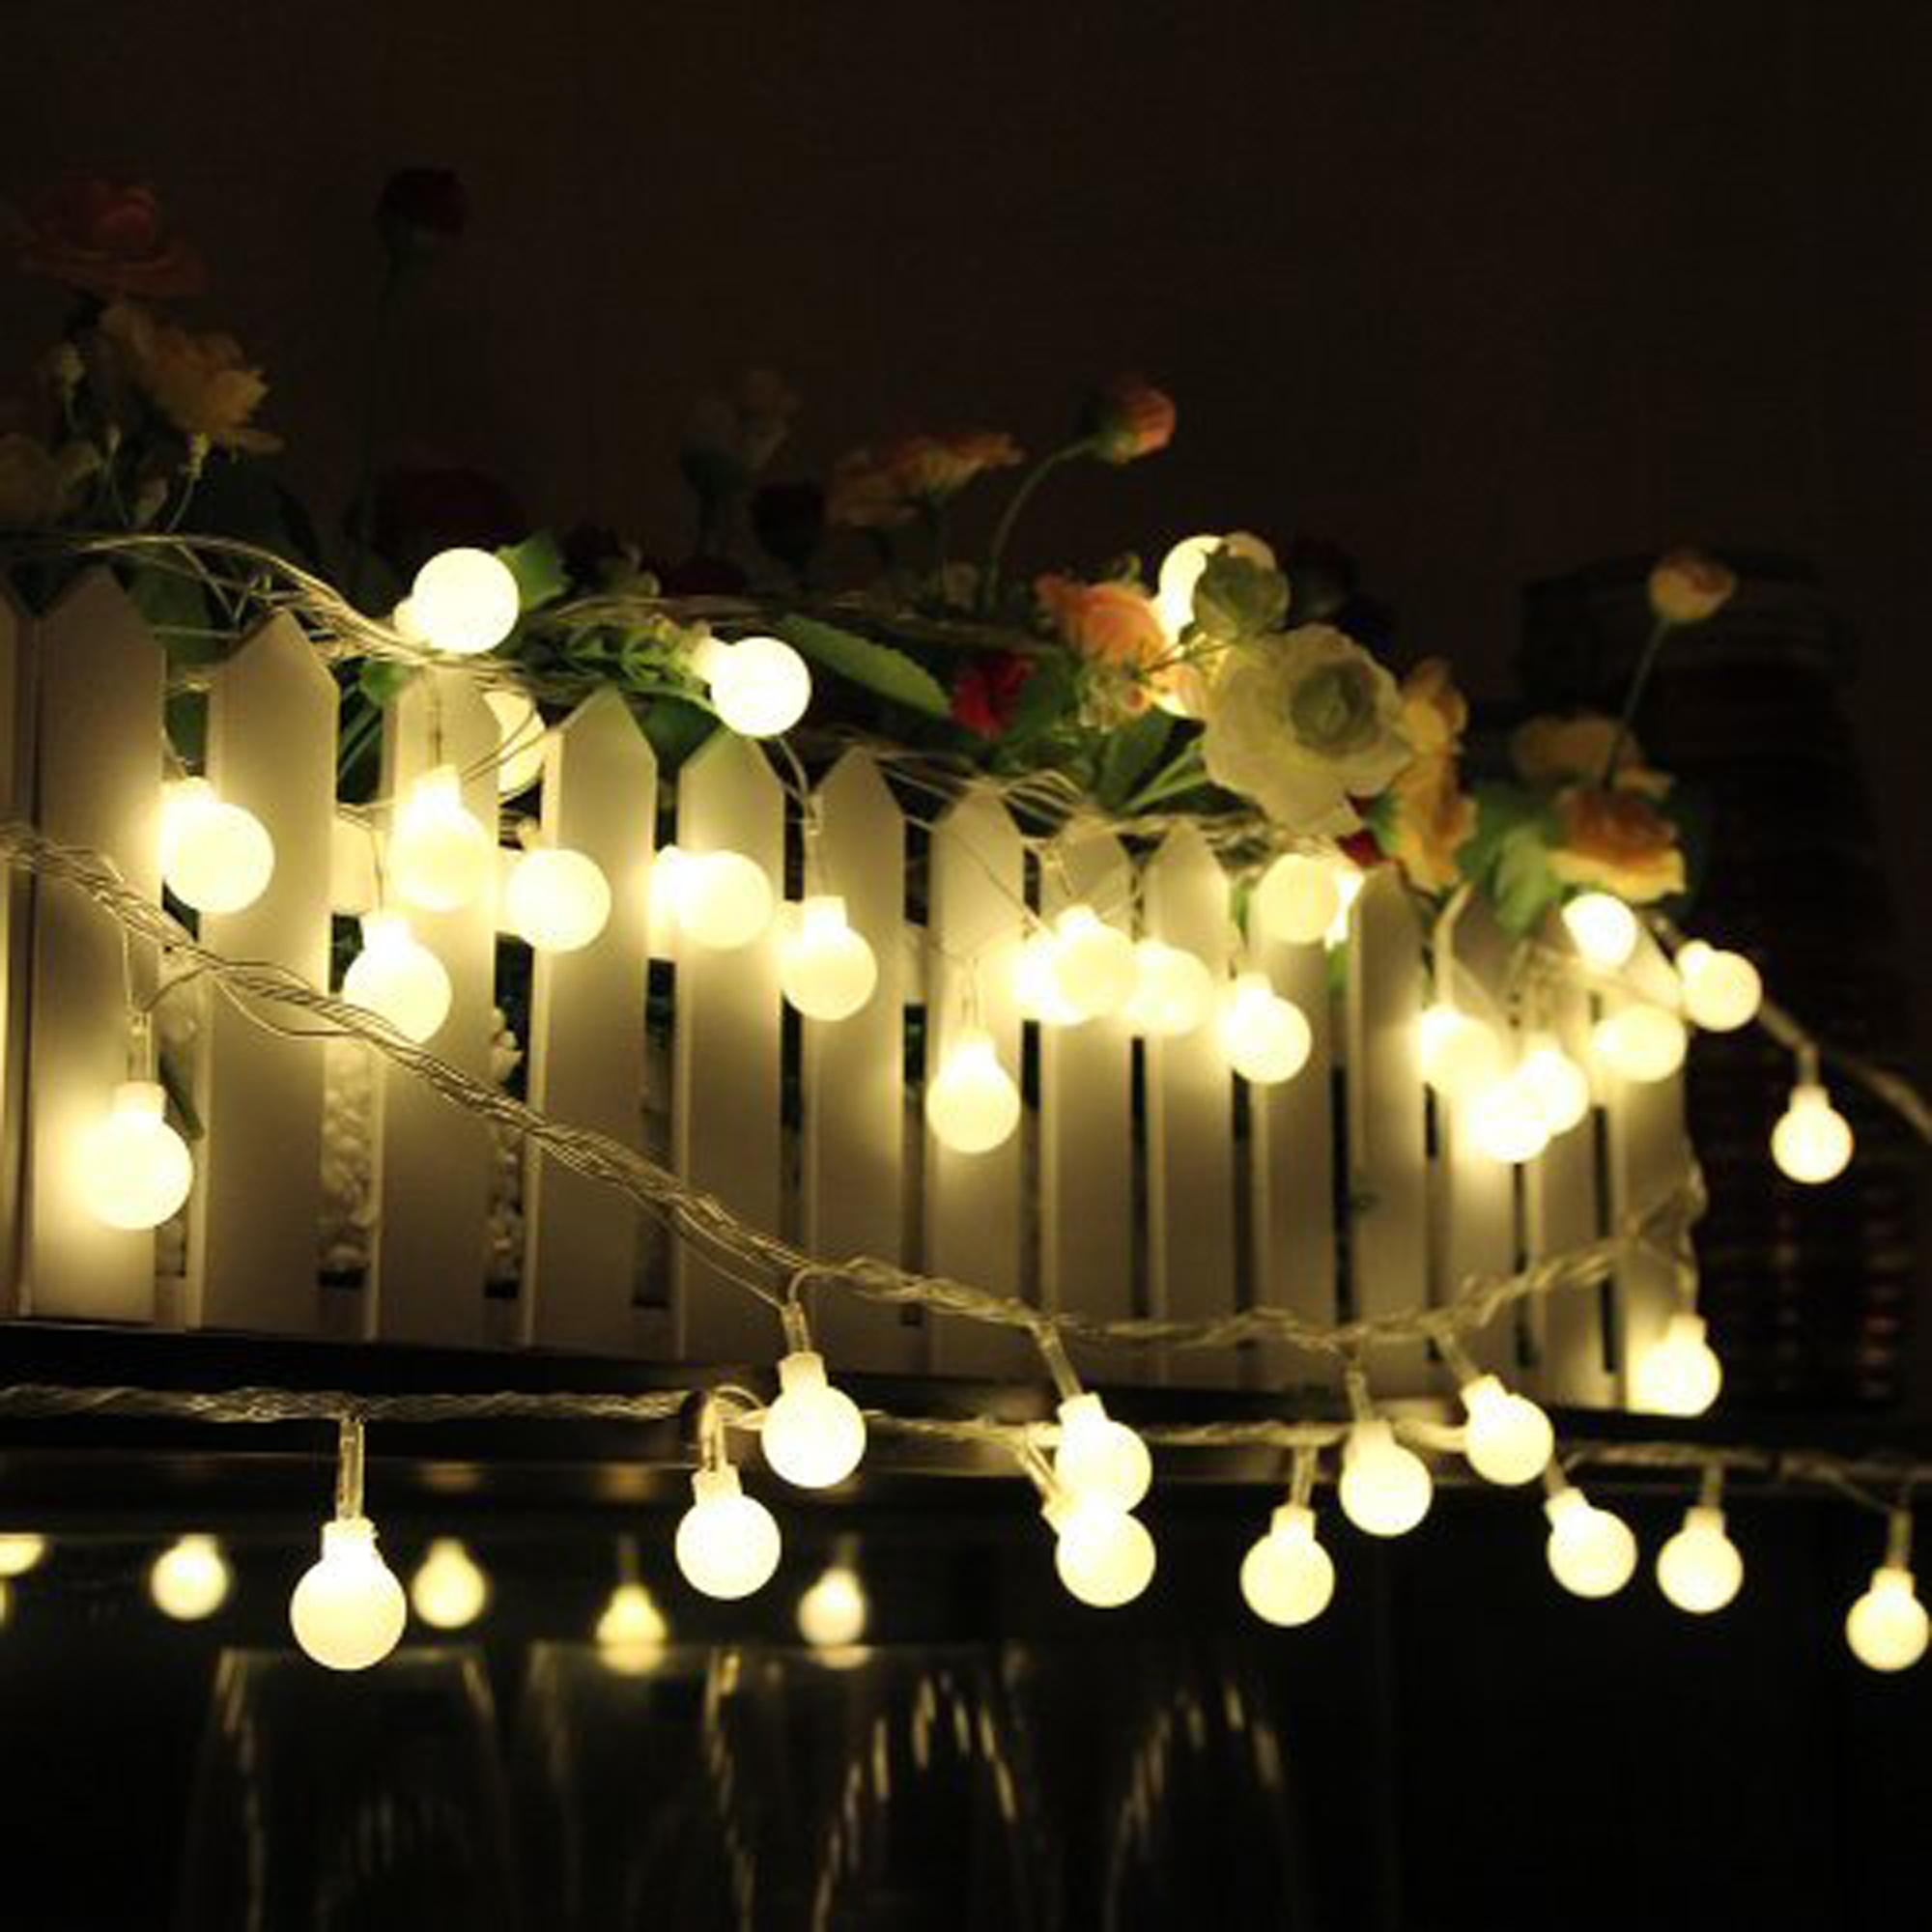 ball fairy lights. 100 led 32.8ft globe string lights led ball fairy for wedding party warm white g